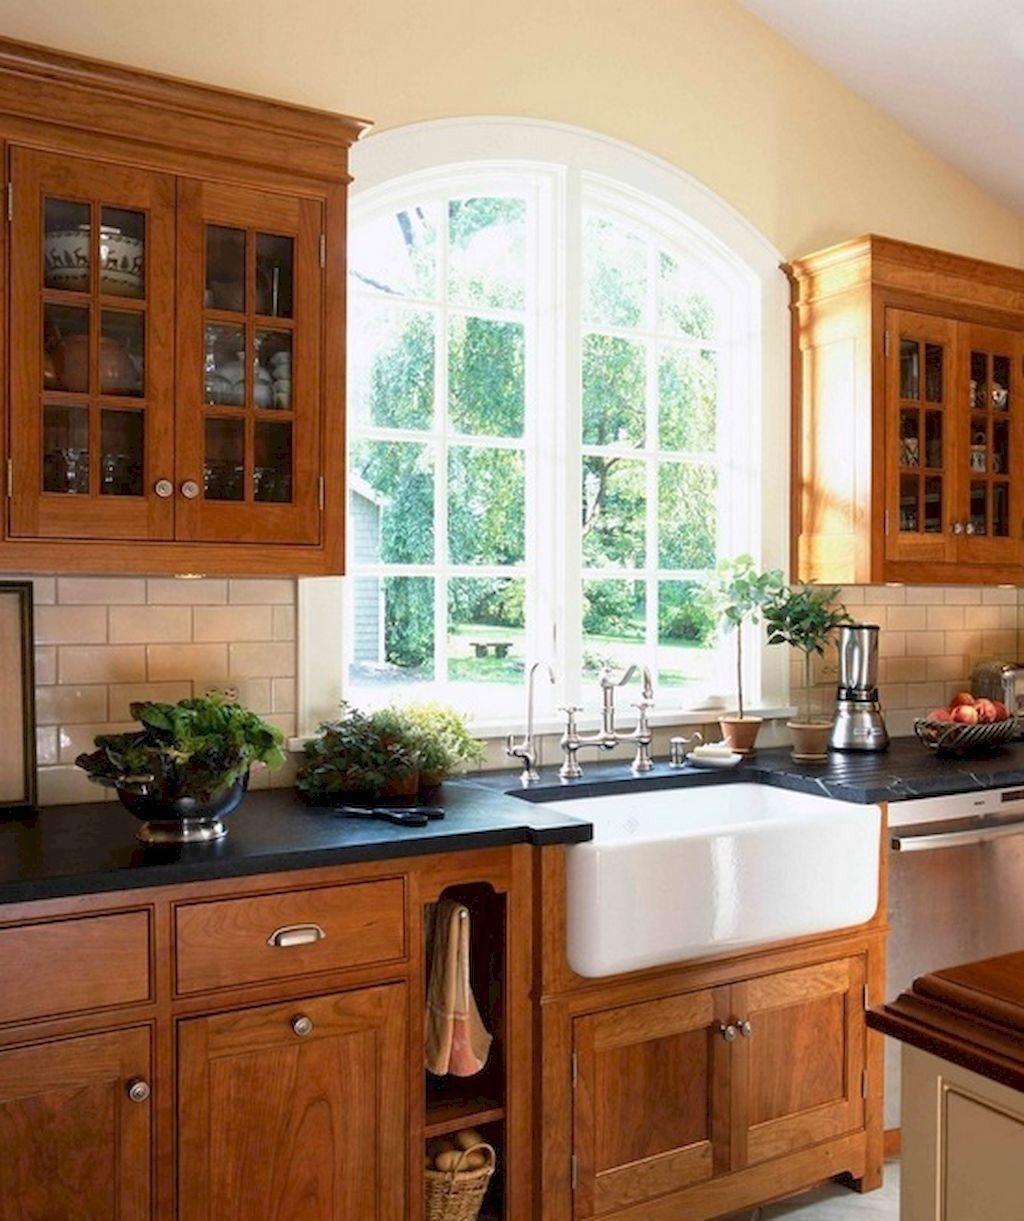 37 Gorgeous Farmhouse Kitchen Cabinets Design Ideas Kitchencabinets New Kitchen Cabinets Kitchen Cabinet Design Wood Kitchen Cabinets